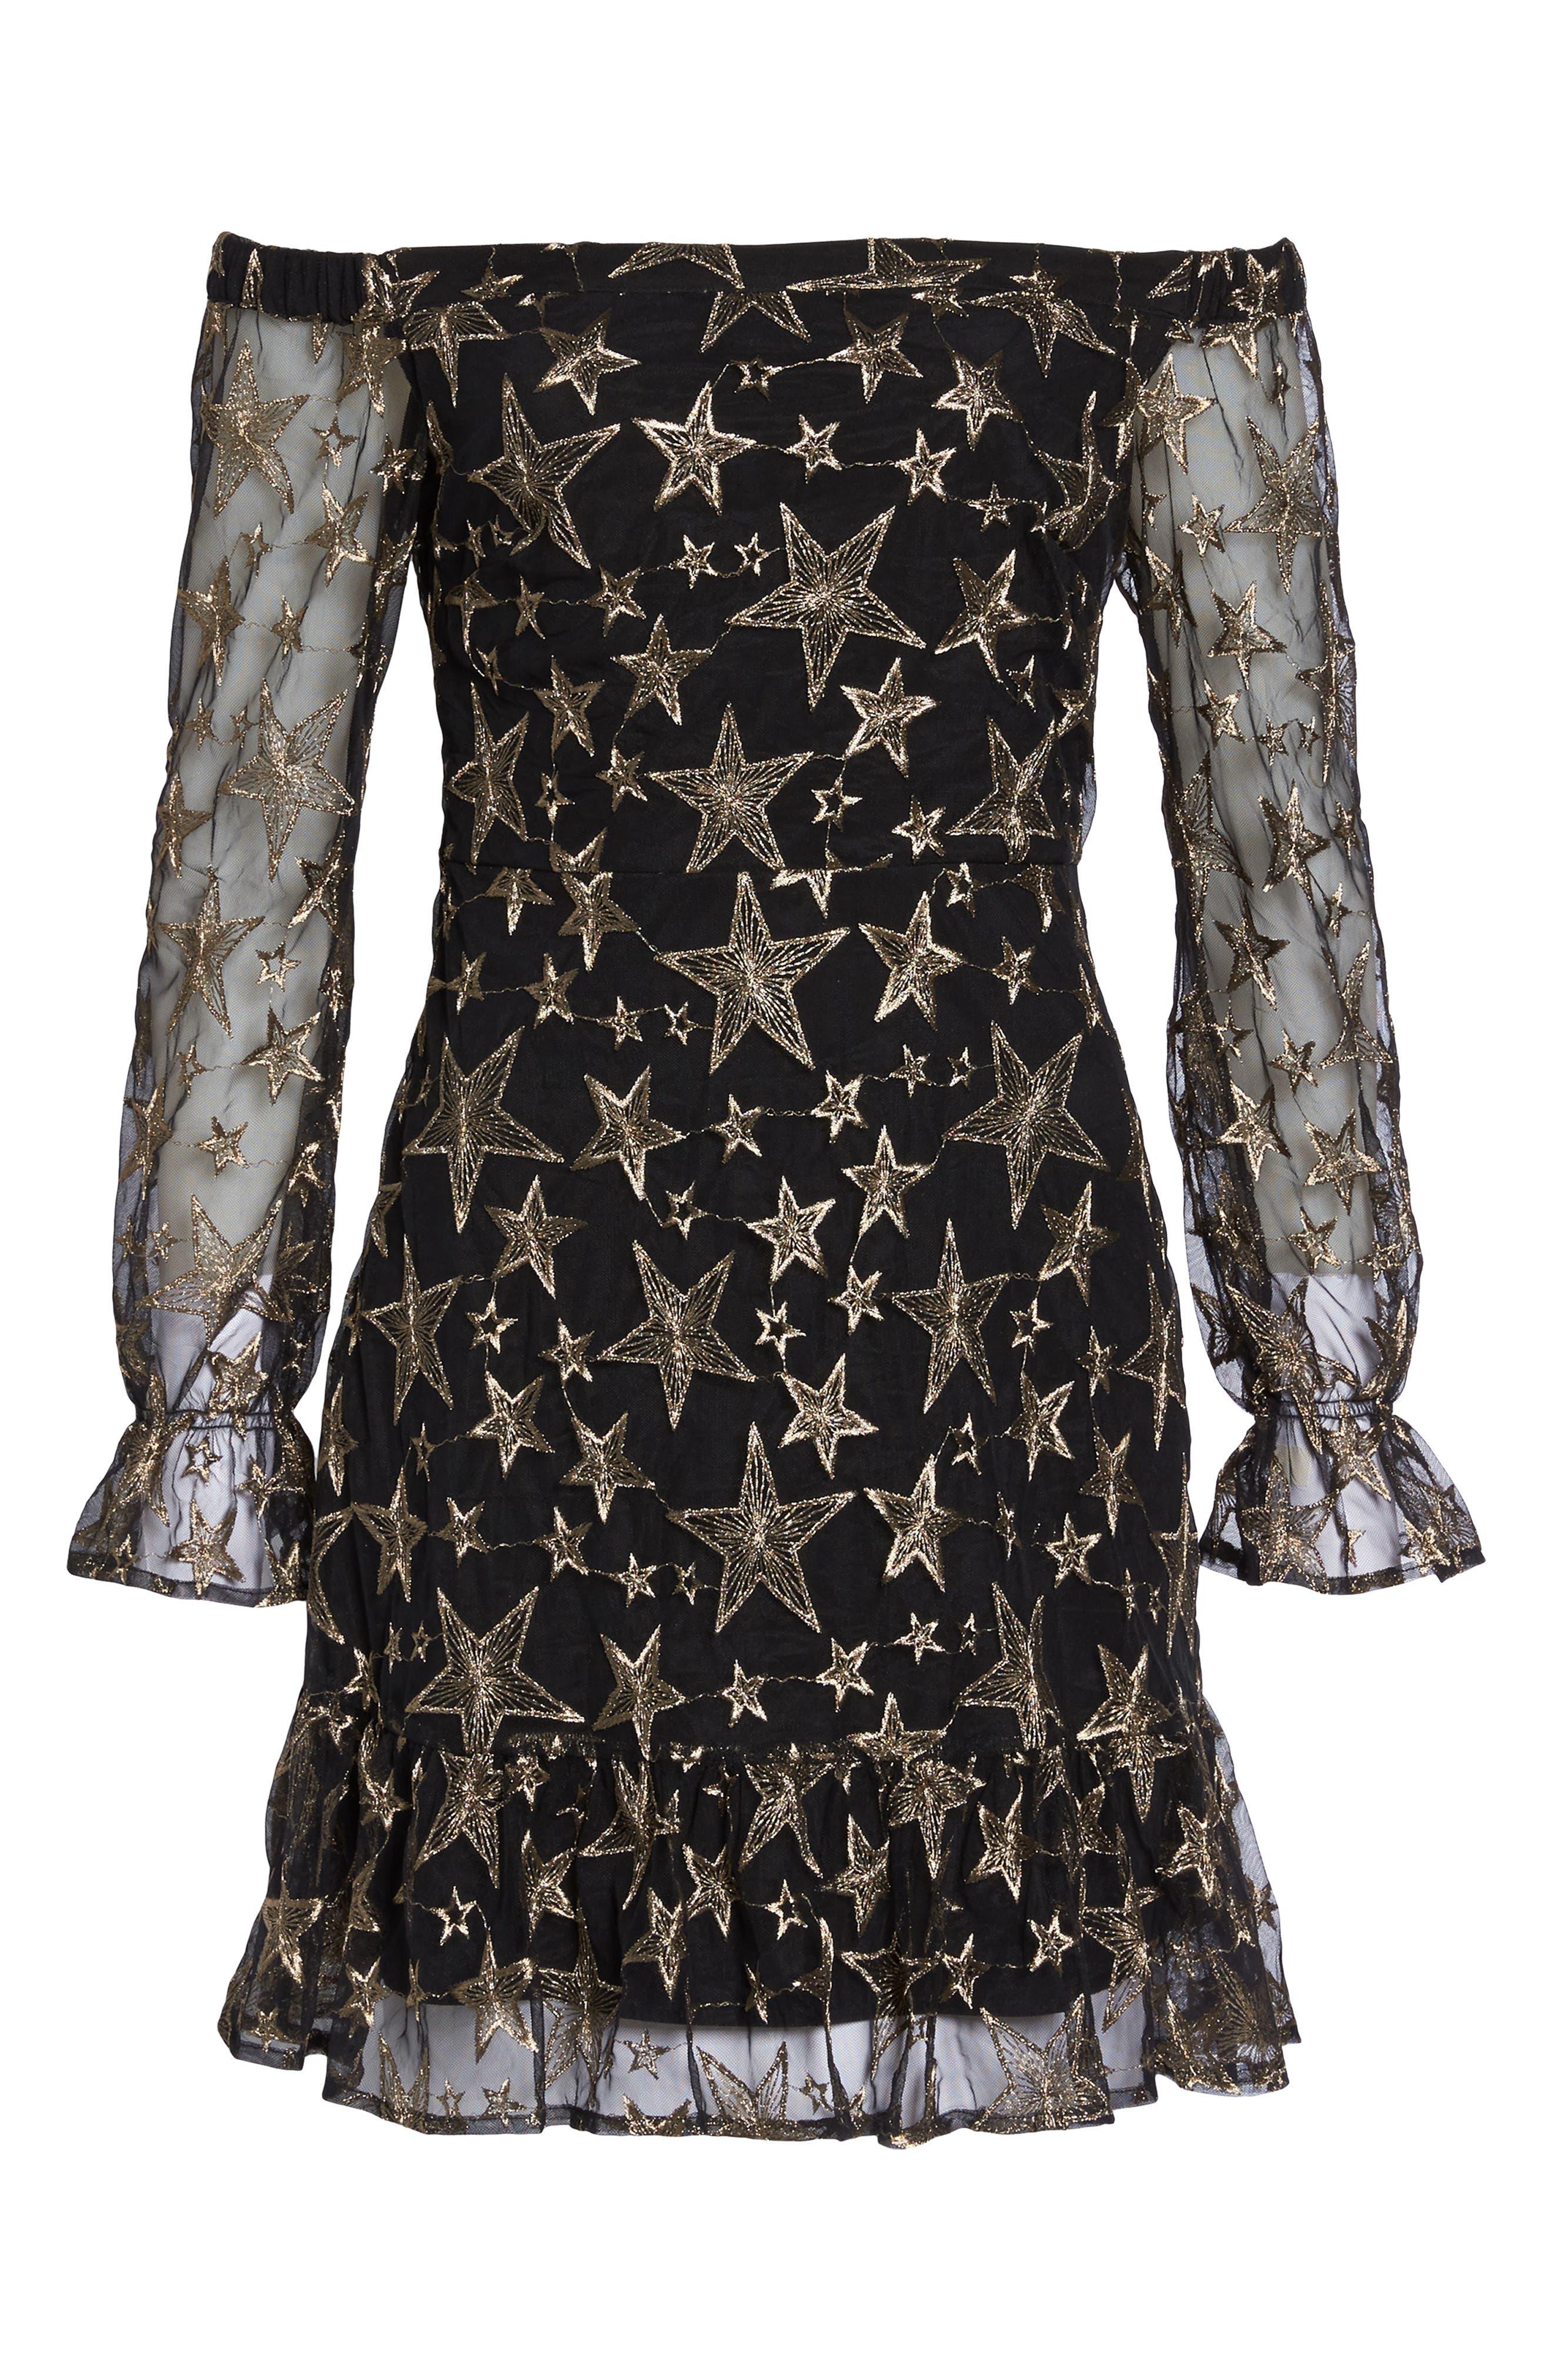 SAM EDELMAN,                             Off the Shoulder Star Embroidered Dress,                             Alternate thumbnail 6, color,                             001